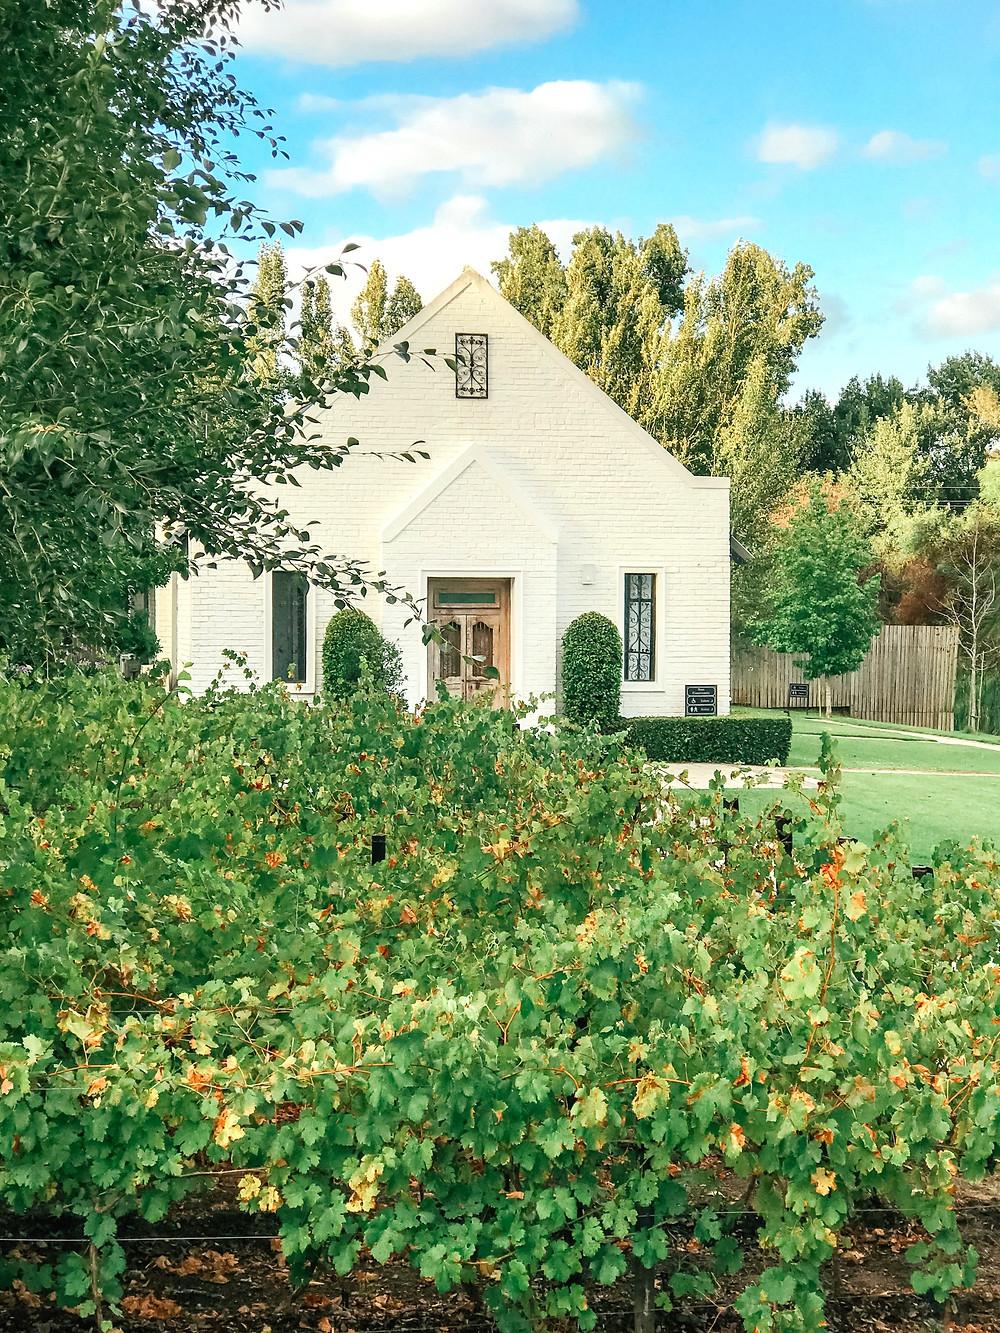 Brenaissance Wine & Stud Estate l South Africa Winelands l A Style Alike l Travel